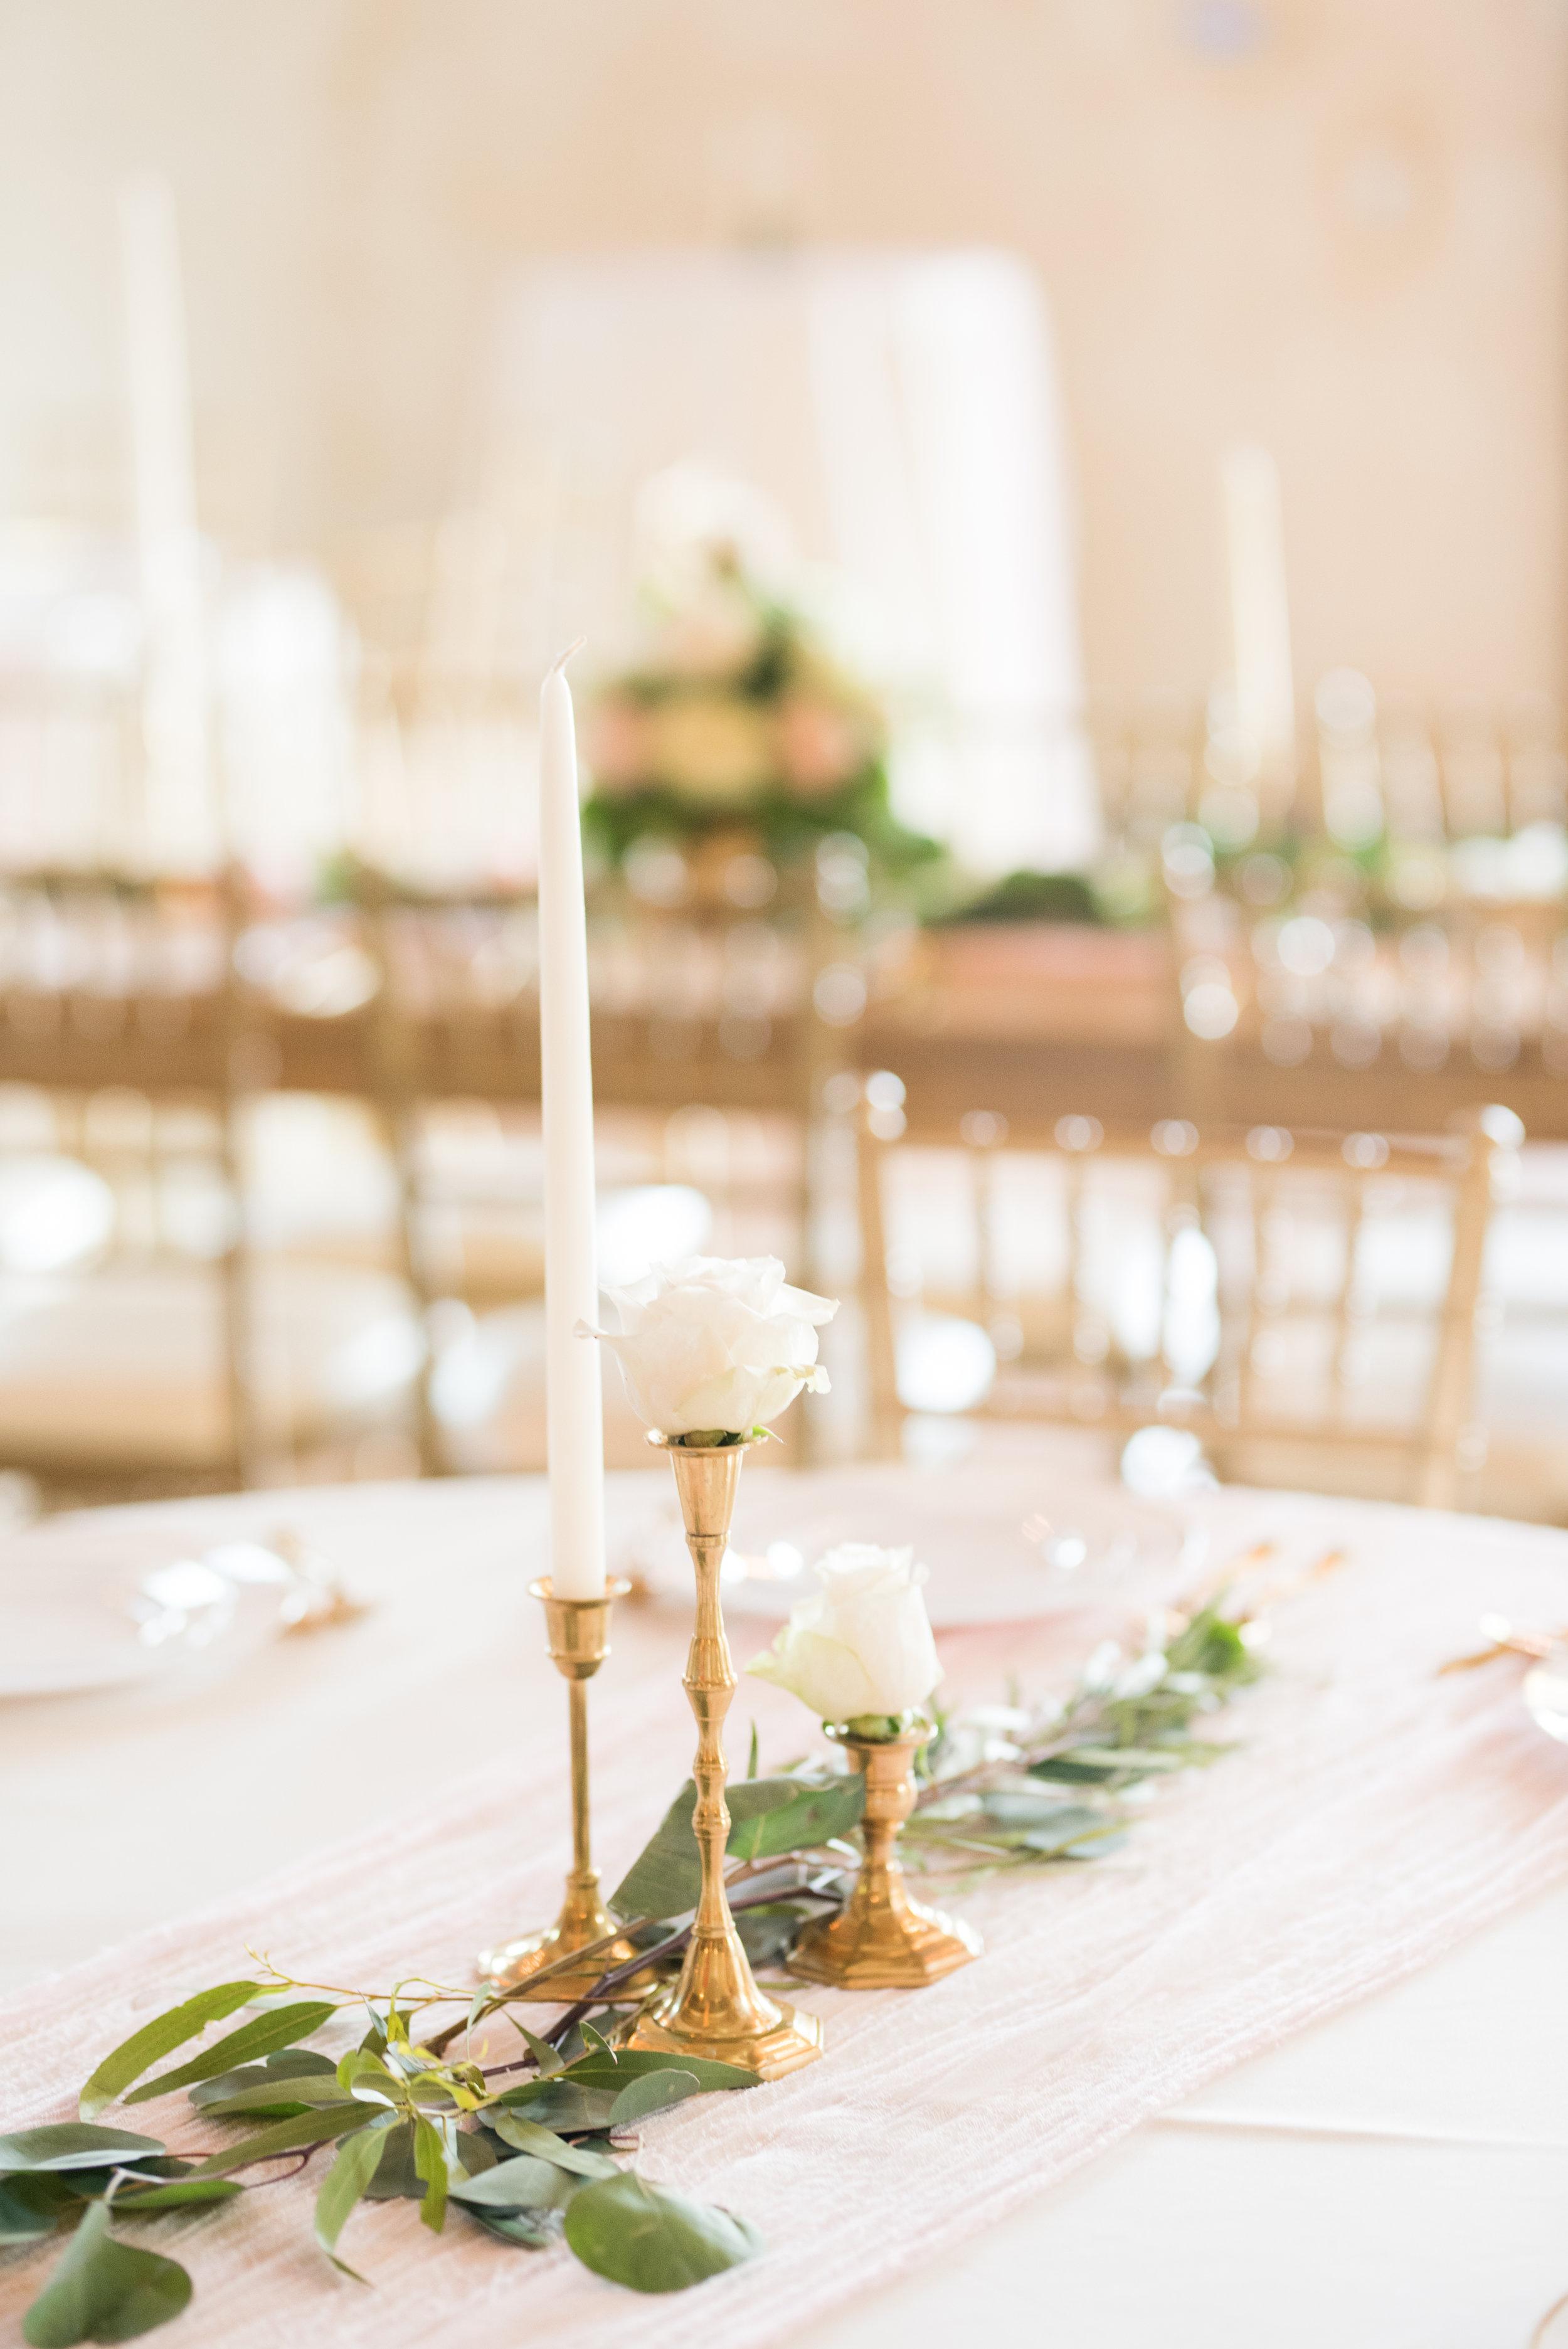 The Barn at Bridlewood wedding in Hattiesburg, Mississippi (MS) in June |  Wedding Venue Decor | florals | candlesticks | candelabra | greenery